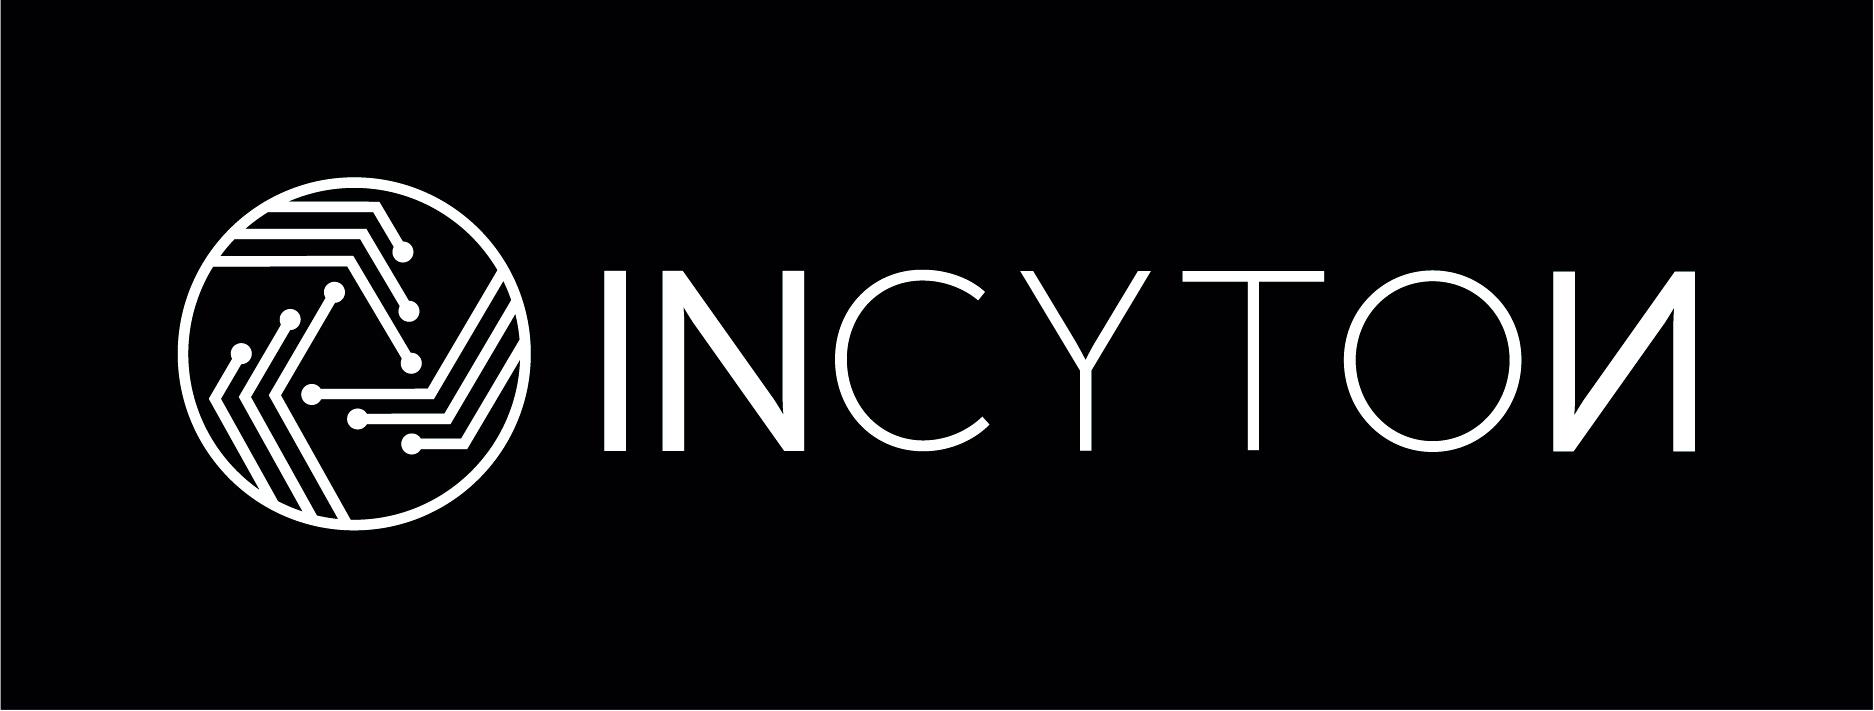 INCYTON GmbH